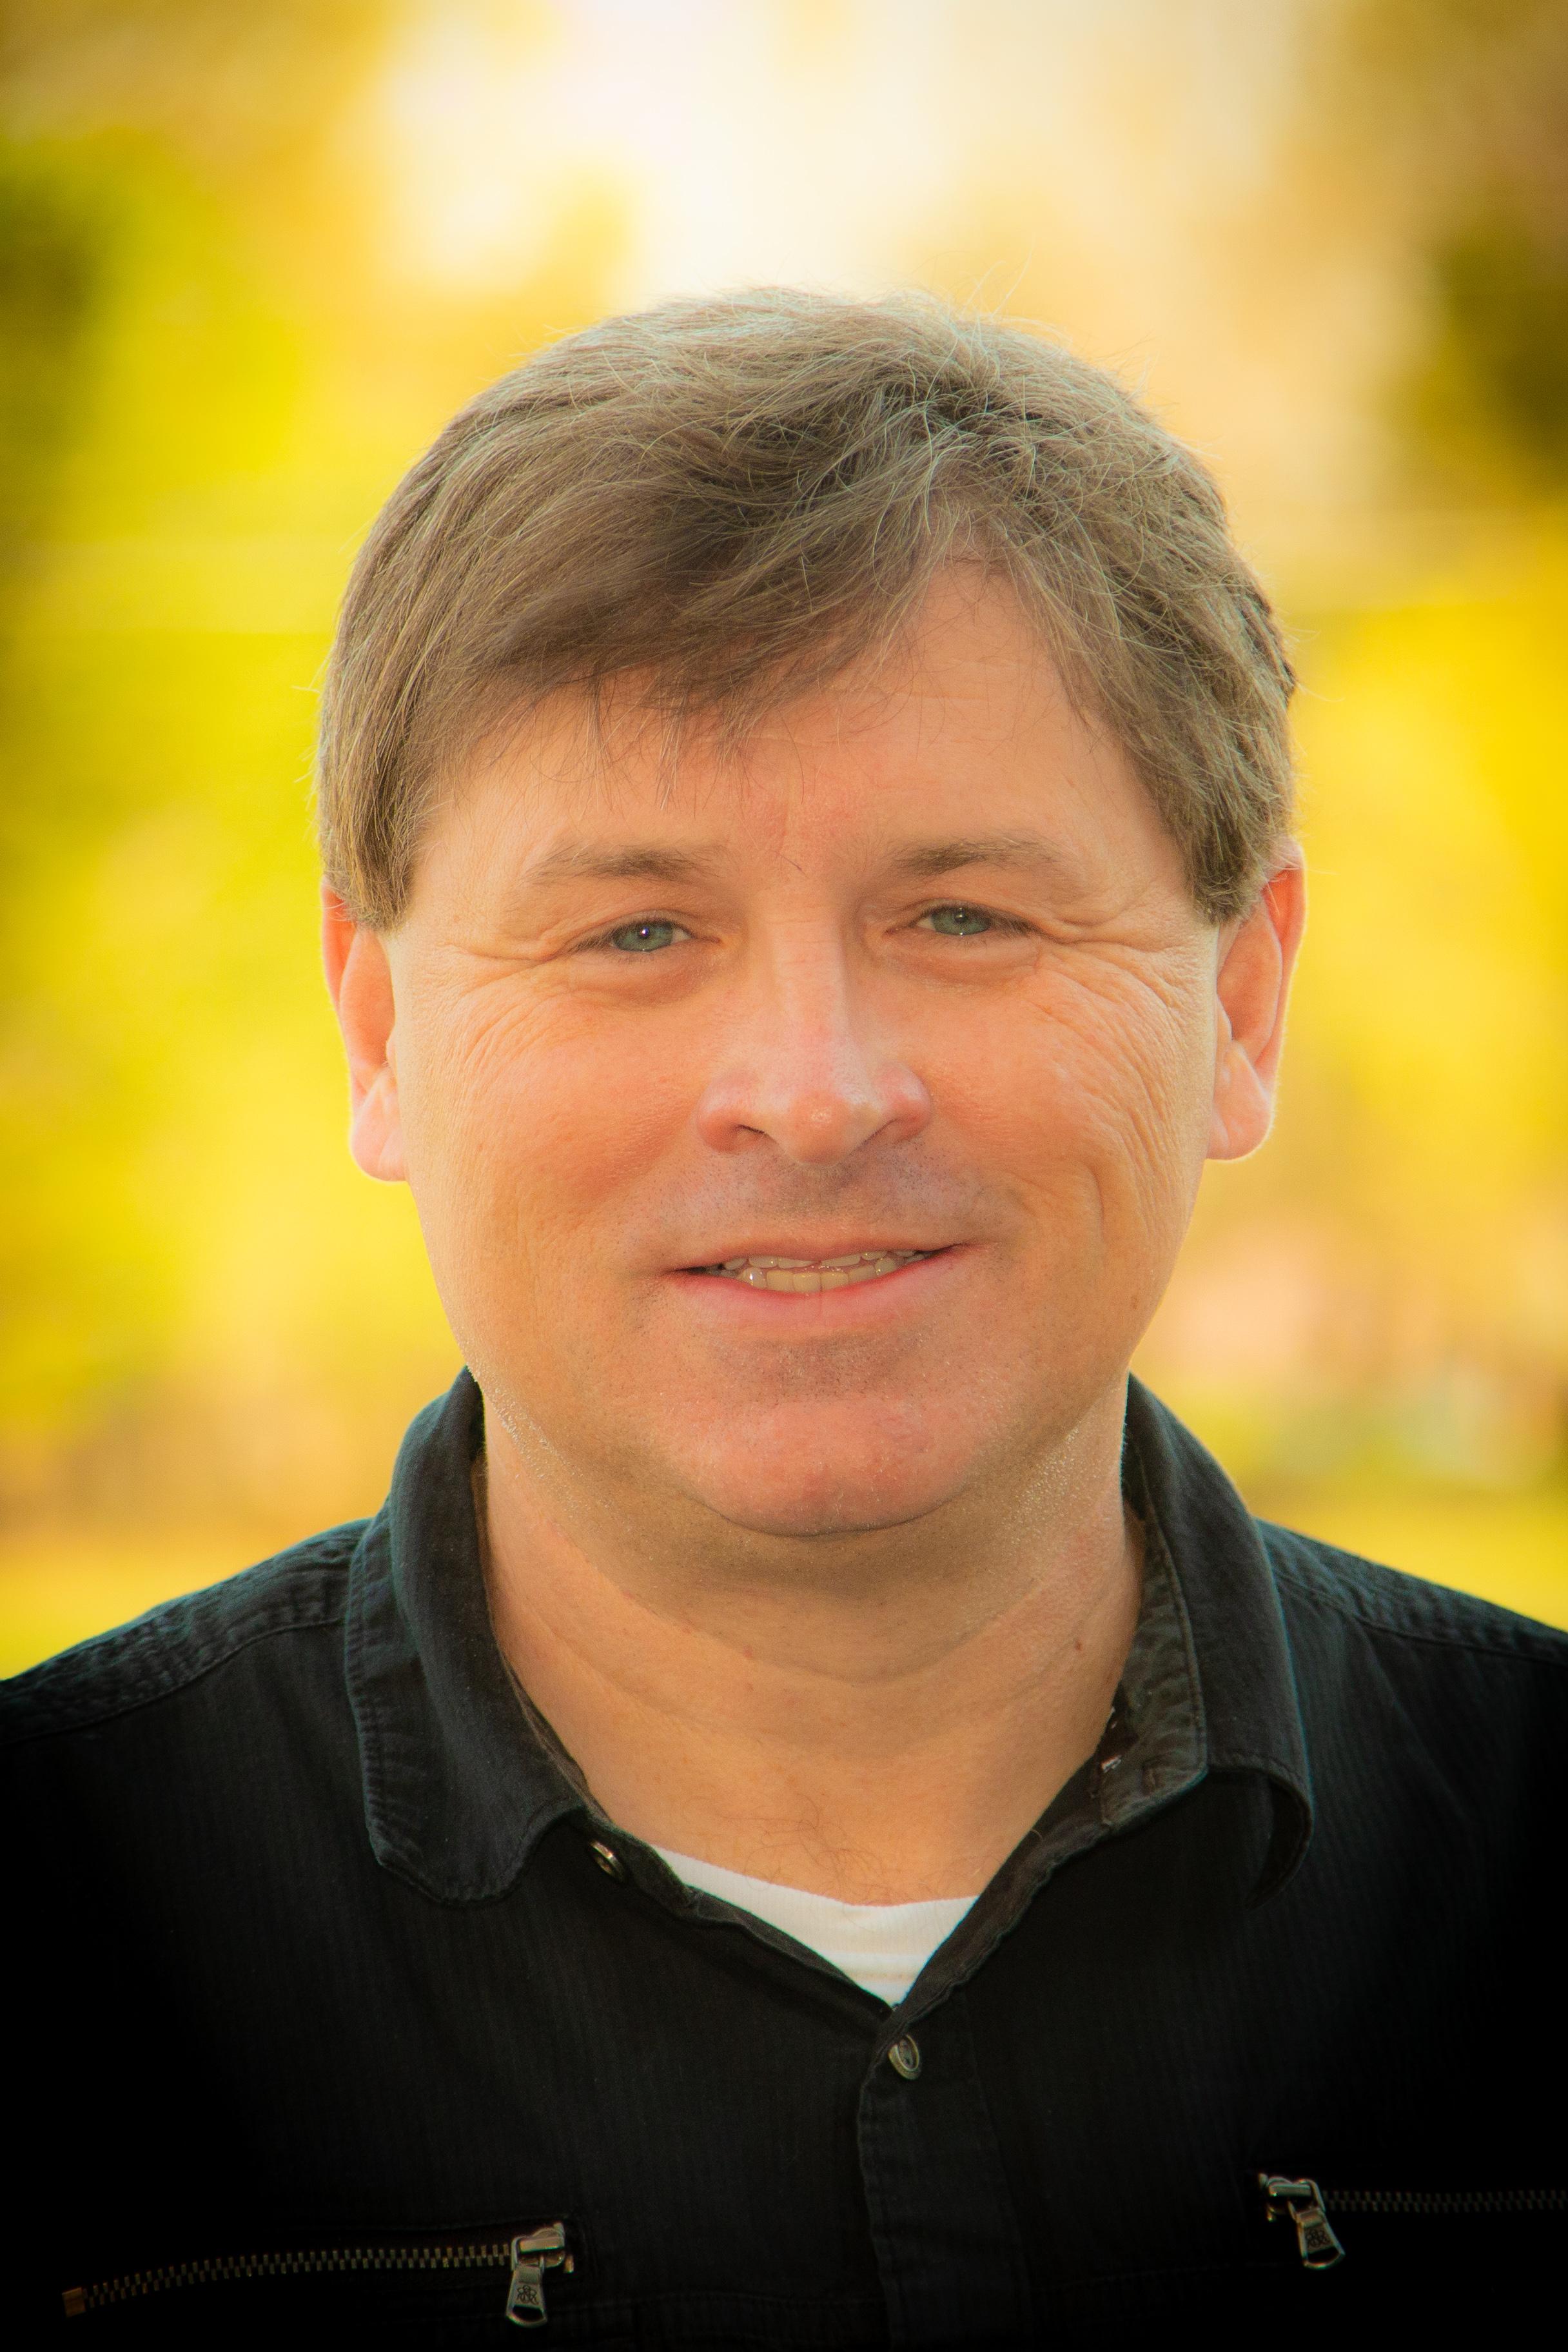 Paul Durham - Missions Pastor